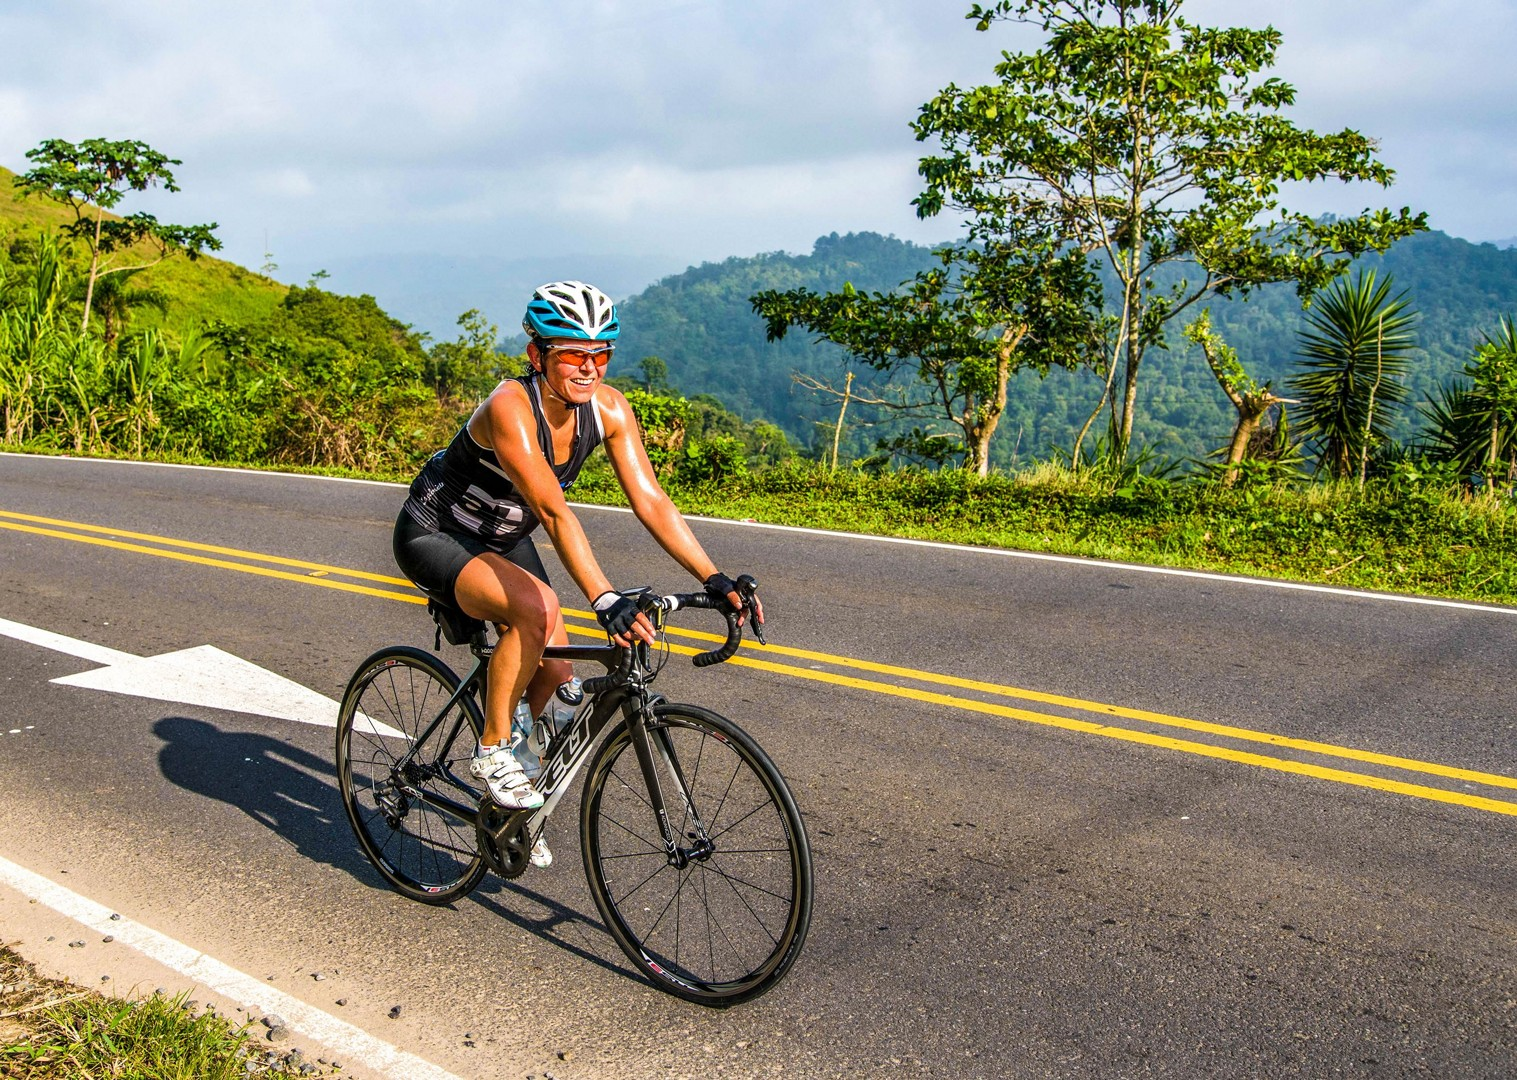 dsc_2778_24074754829_o.jpg - Costa Rica - Ruta de los Volcanes - Road Cycling